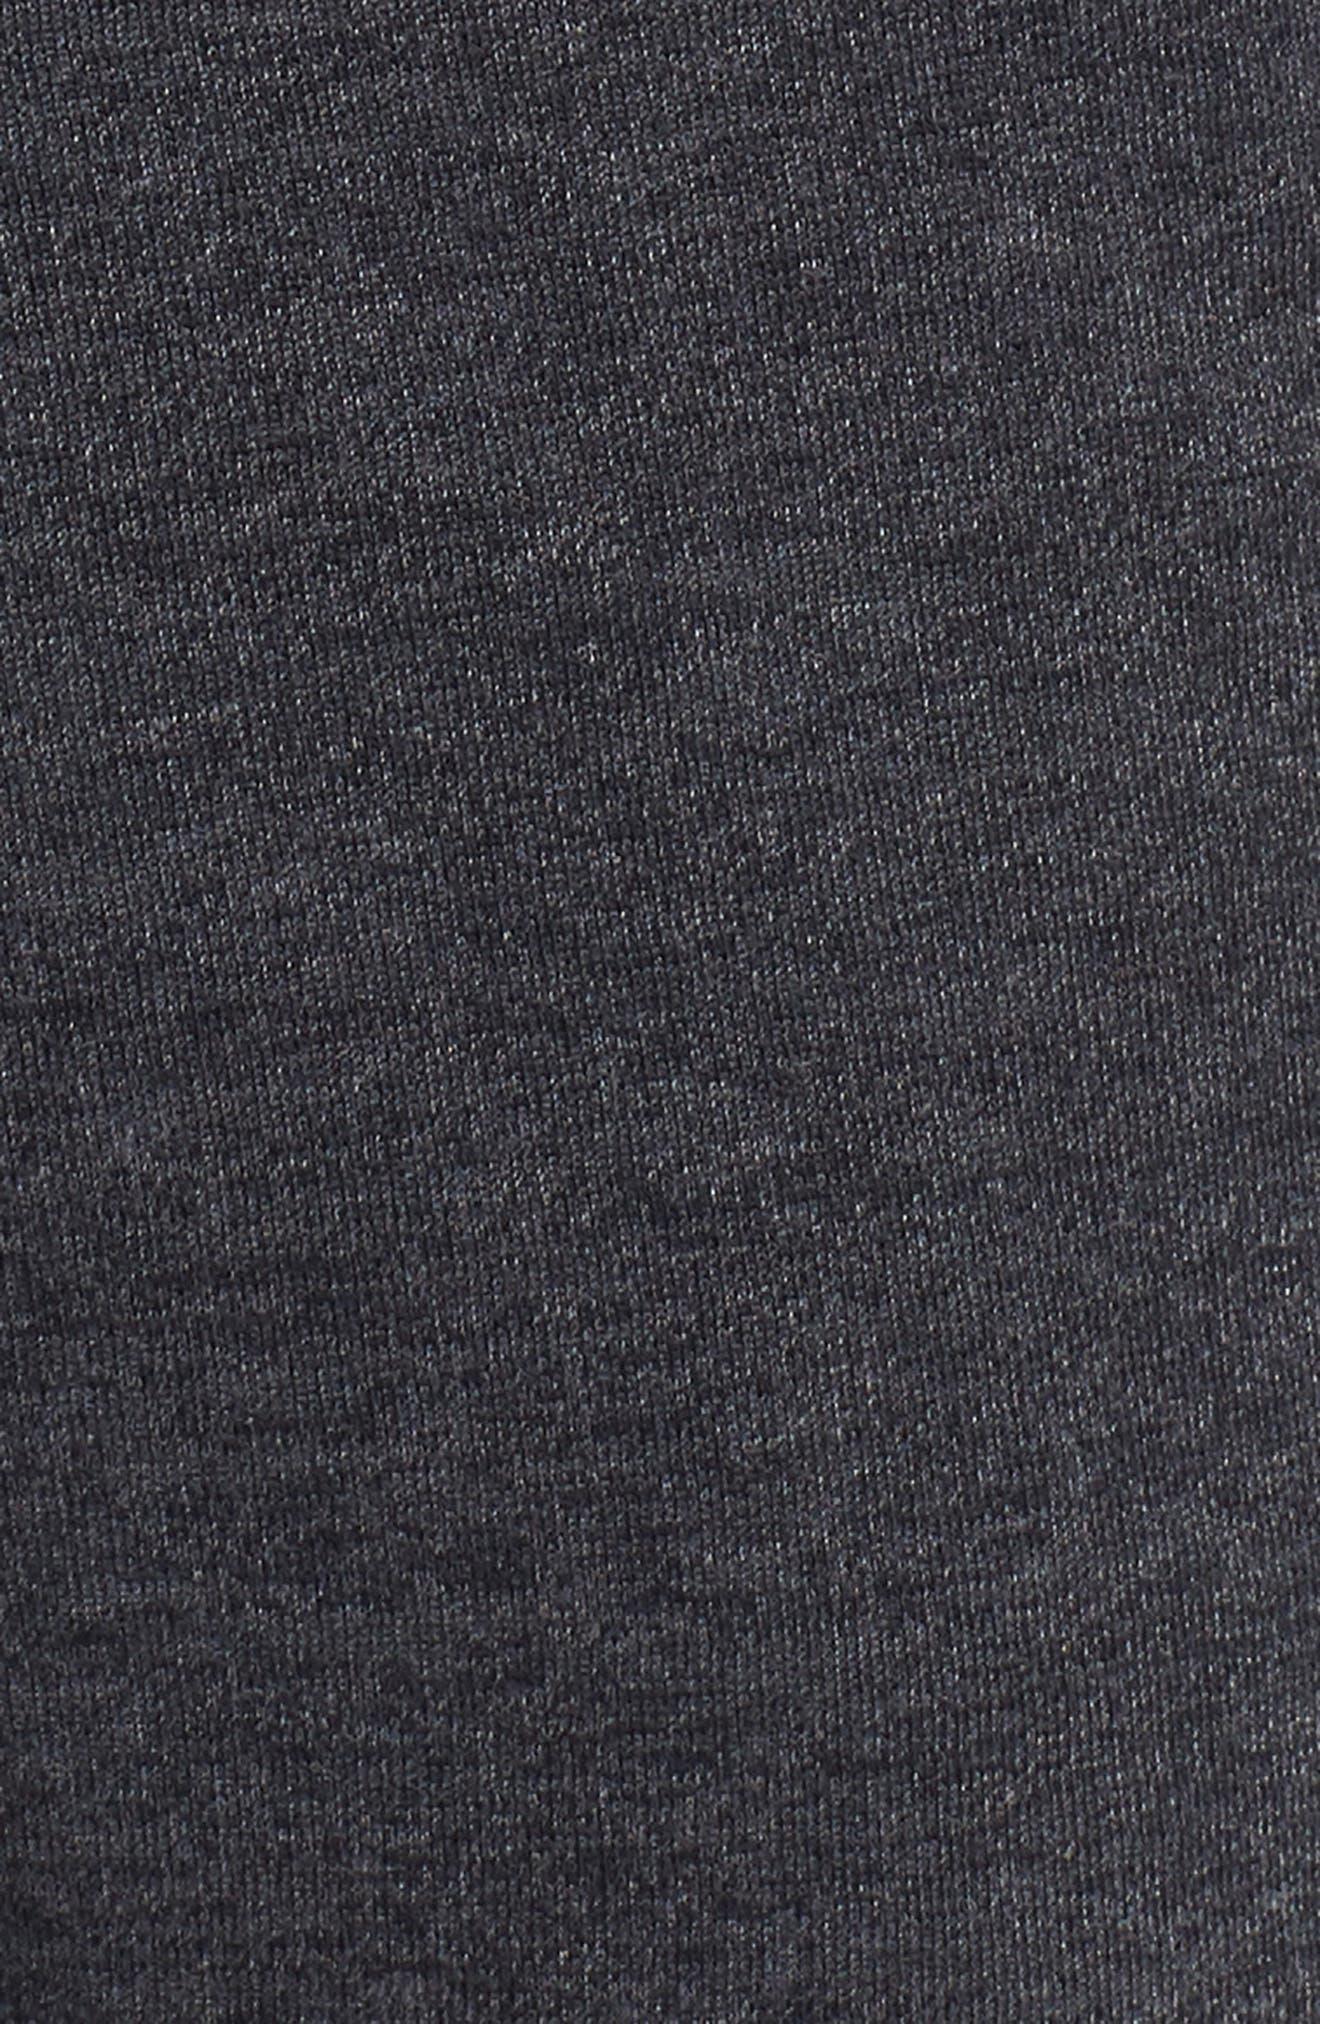 UNDER ARMOUR,                             Unstoppable Double Knit Jogger Pants,                             Alternate thumbnail 5, color,                             001